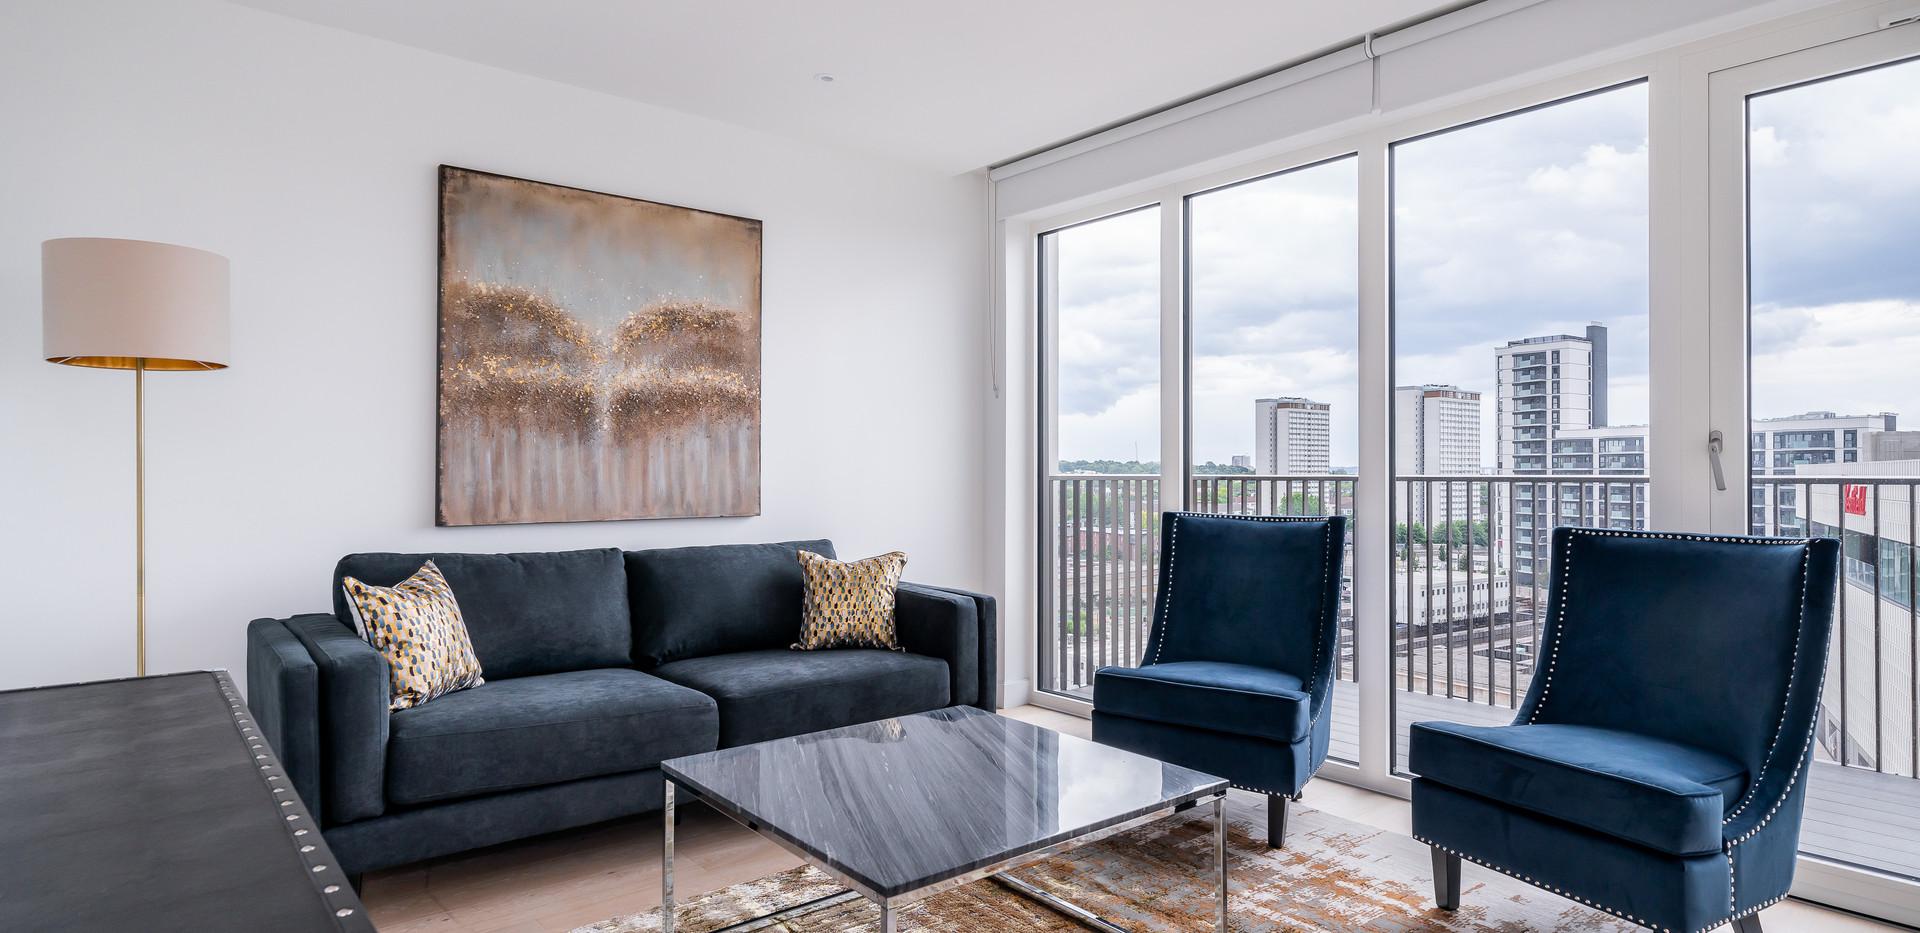 Flat 34, White City Living, 54 Wood Lane